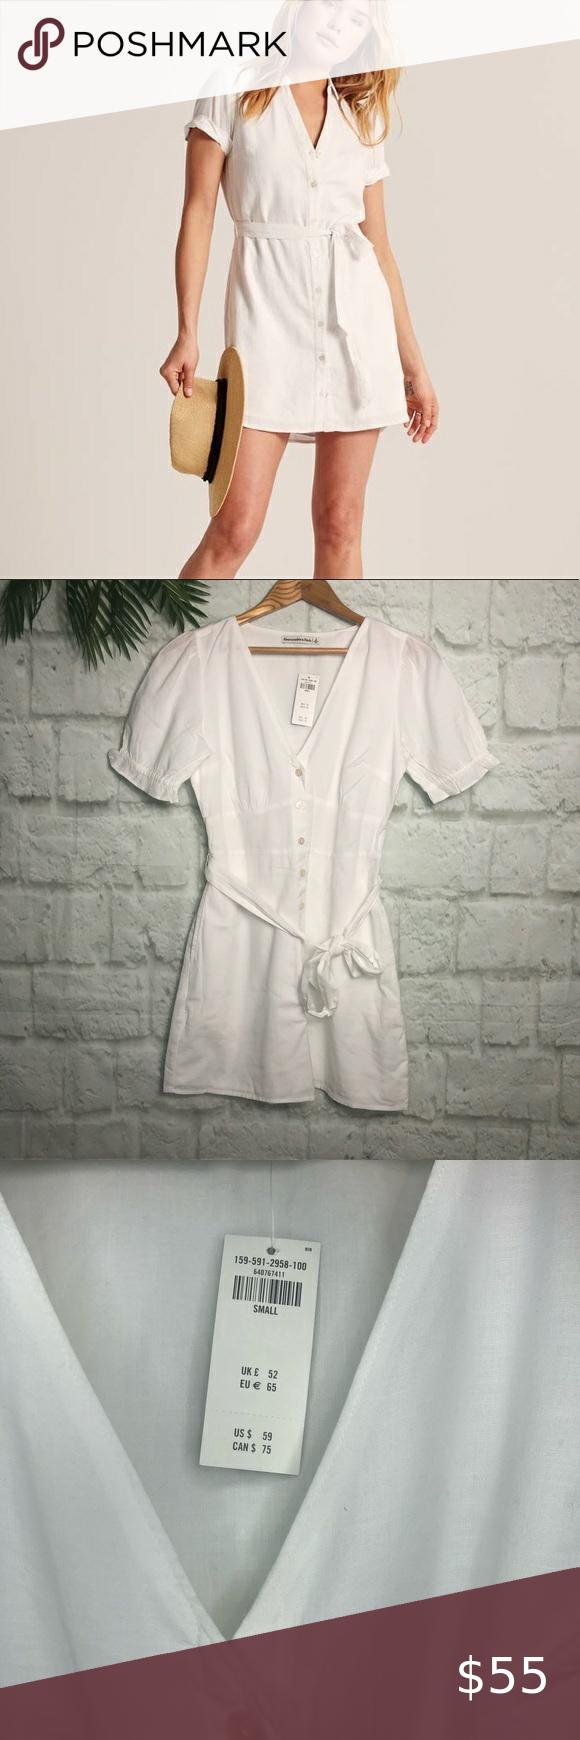 NEW Linen Blend Sleeveless Shirt Dress WHITE NAVY BLUE Floral Print Sizes 16 18